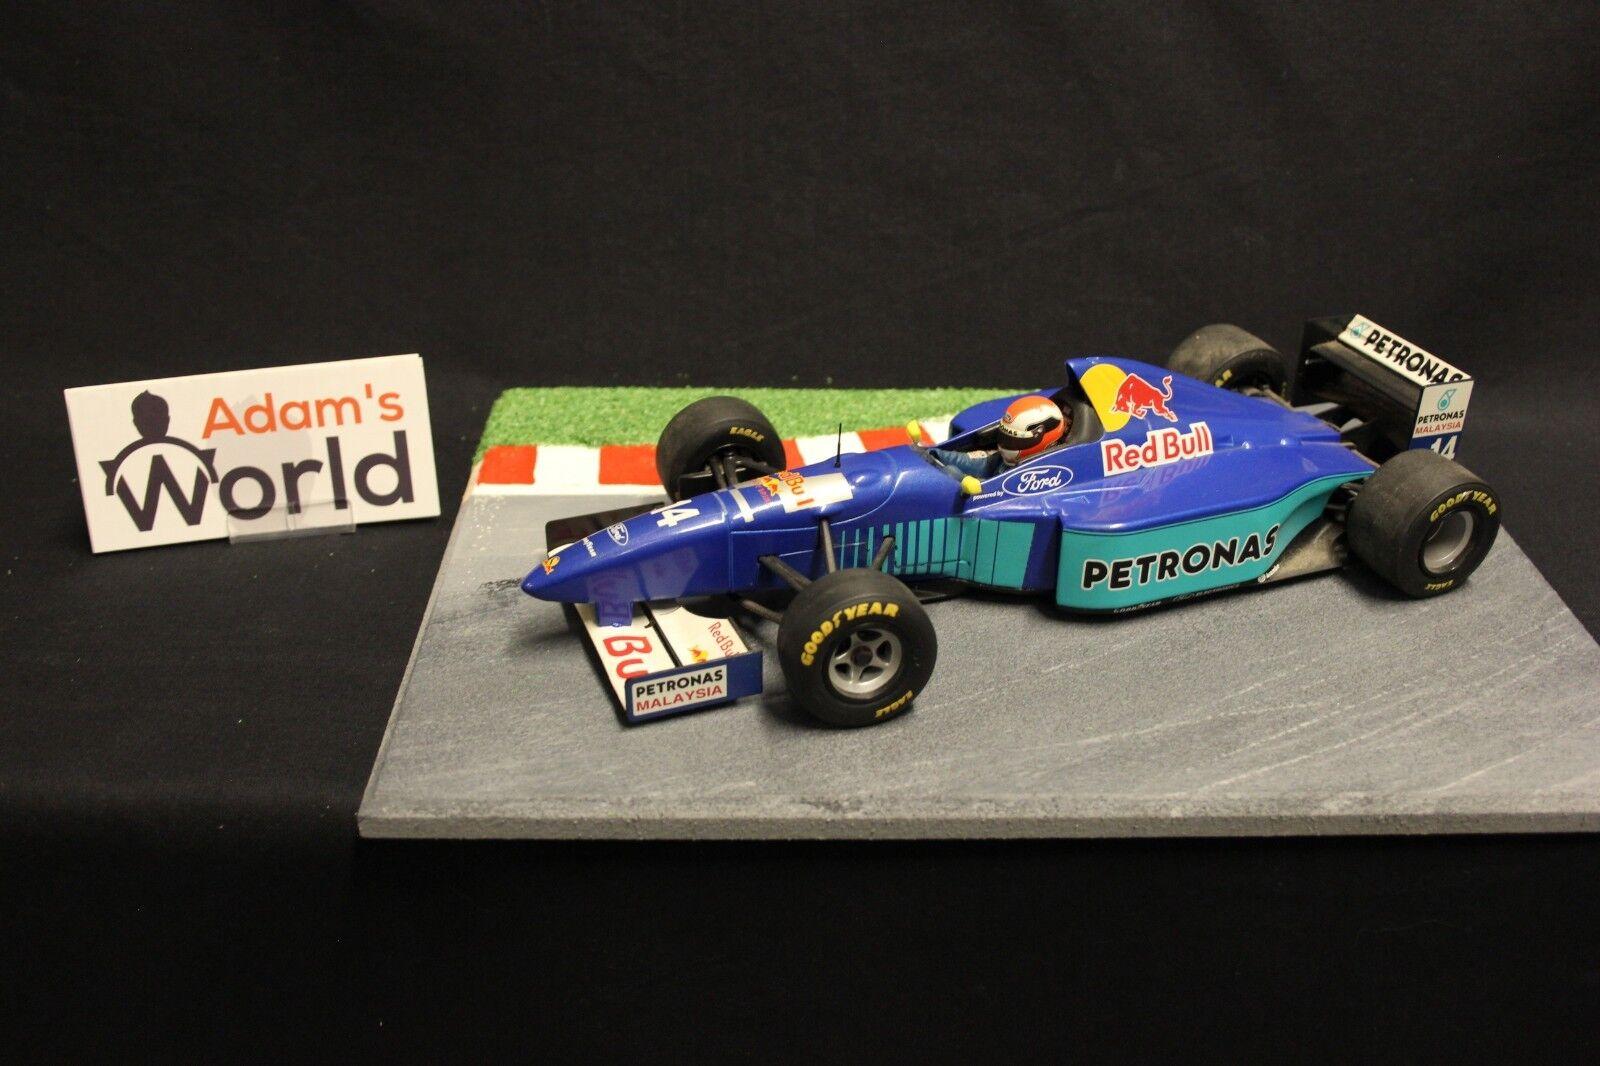 Minichamps Sauber Petronas show car 1996 1:18  14 Johnny Herbert  GBR   F1NB